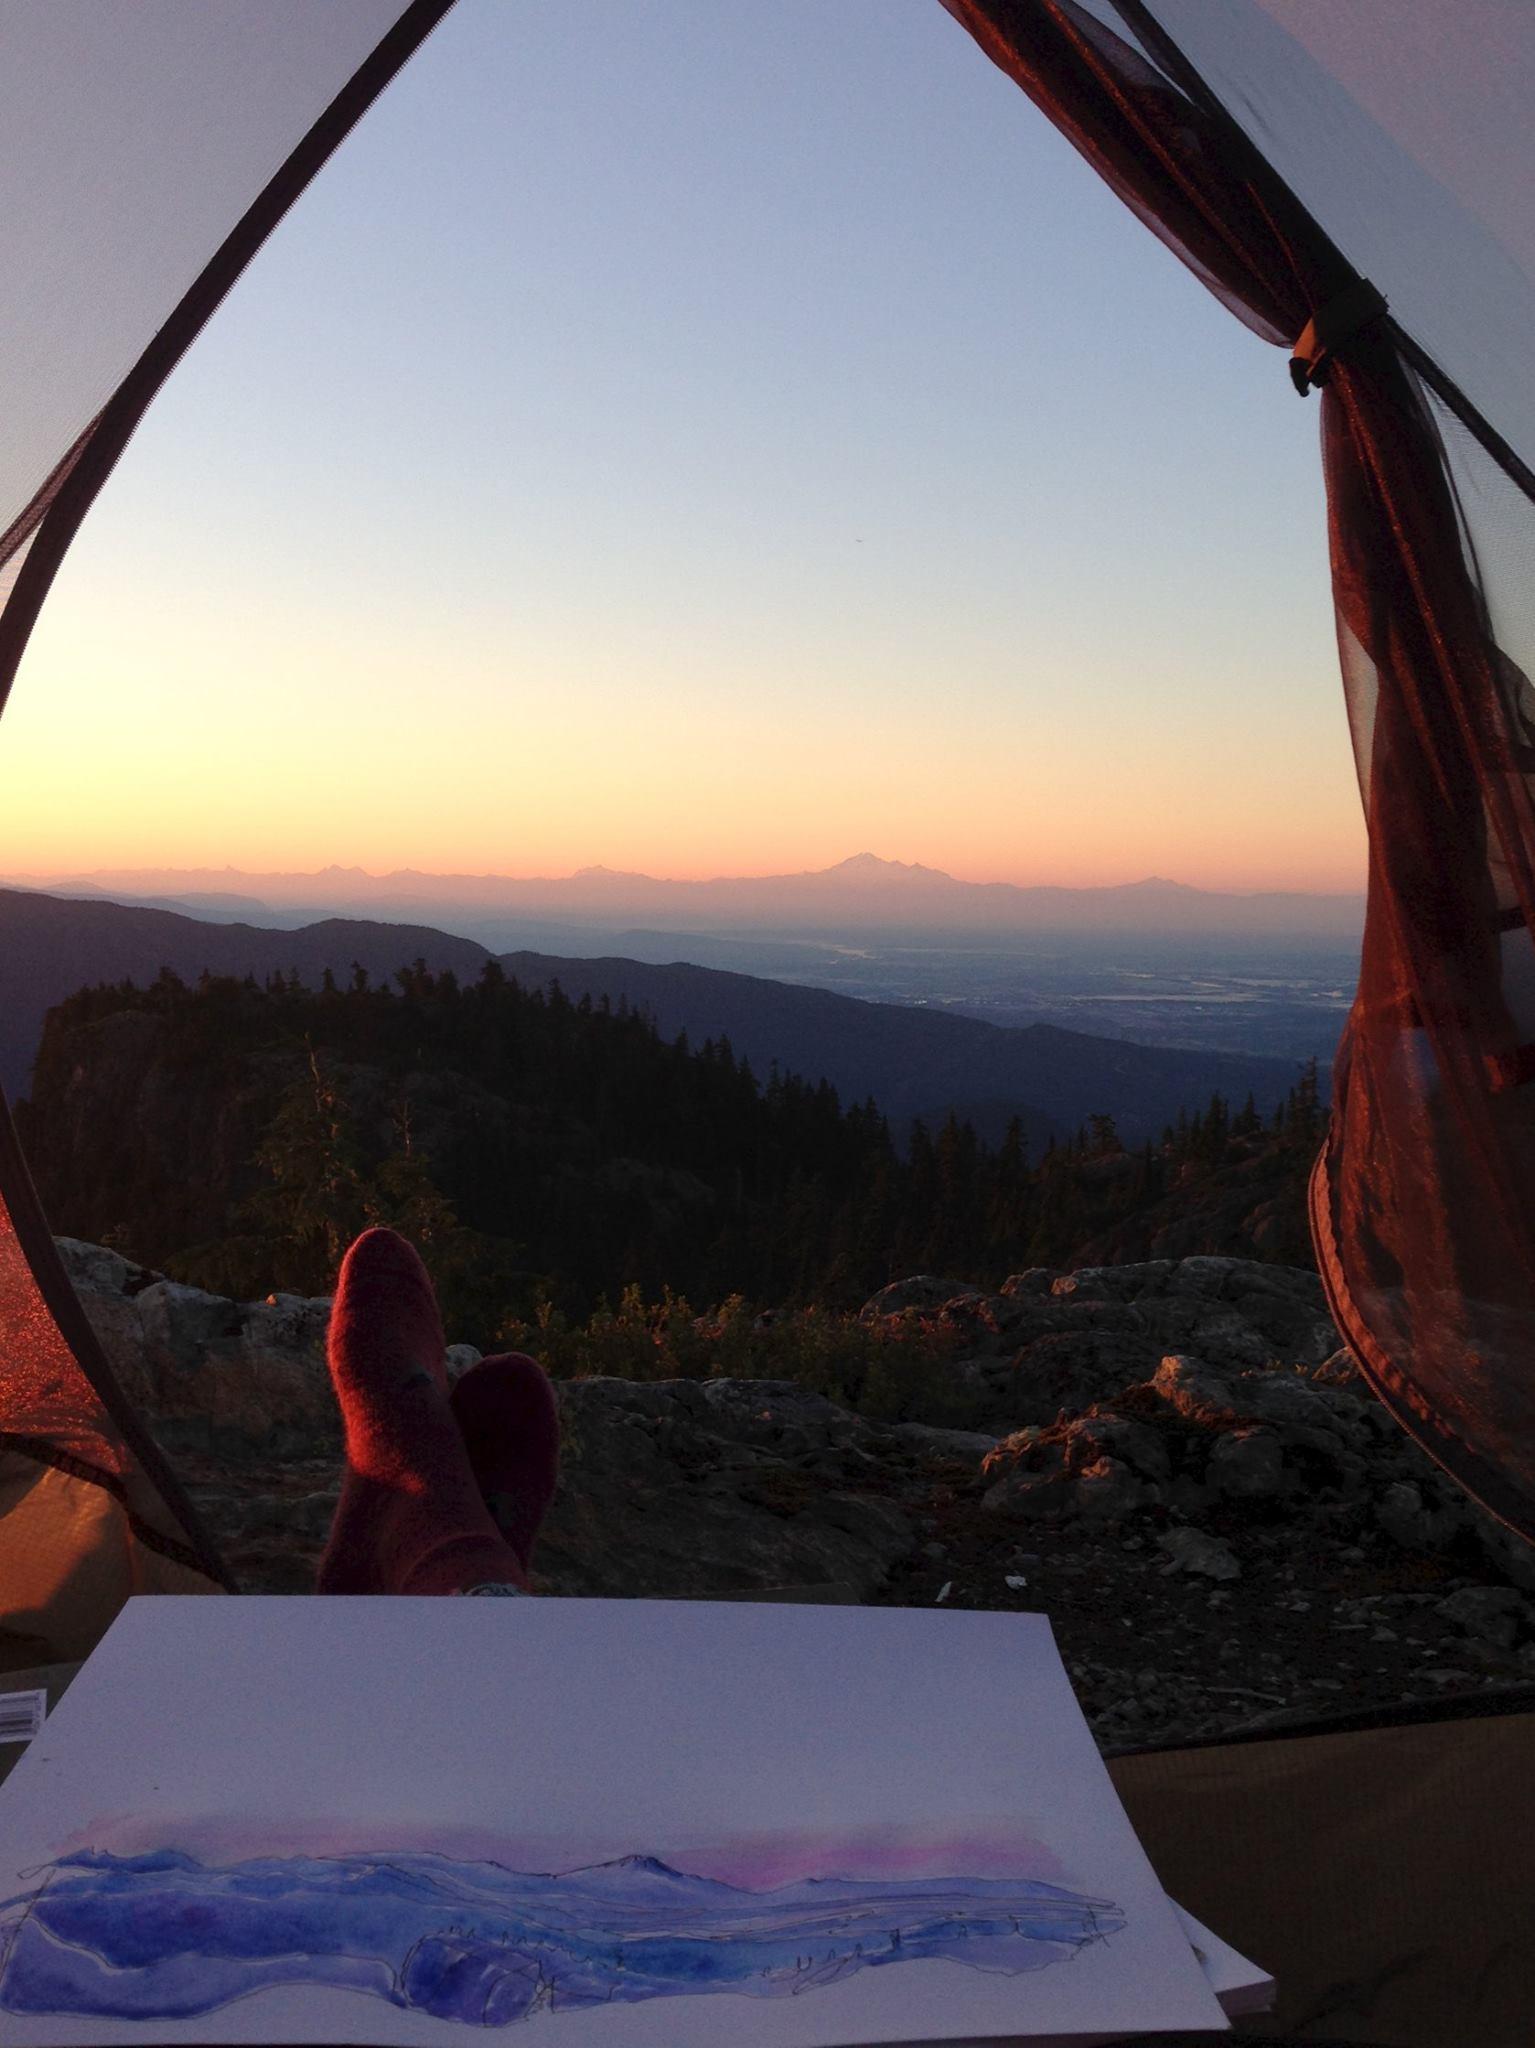 MountSeymour-MountBaker-SunriseCamp-GOOTV.jpg